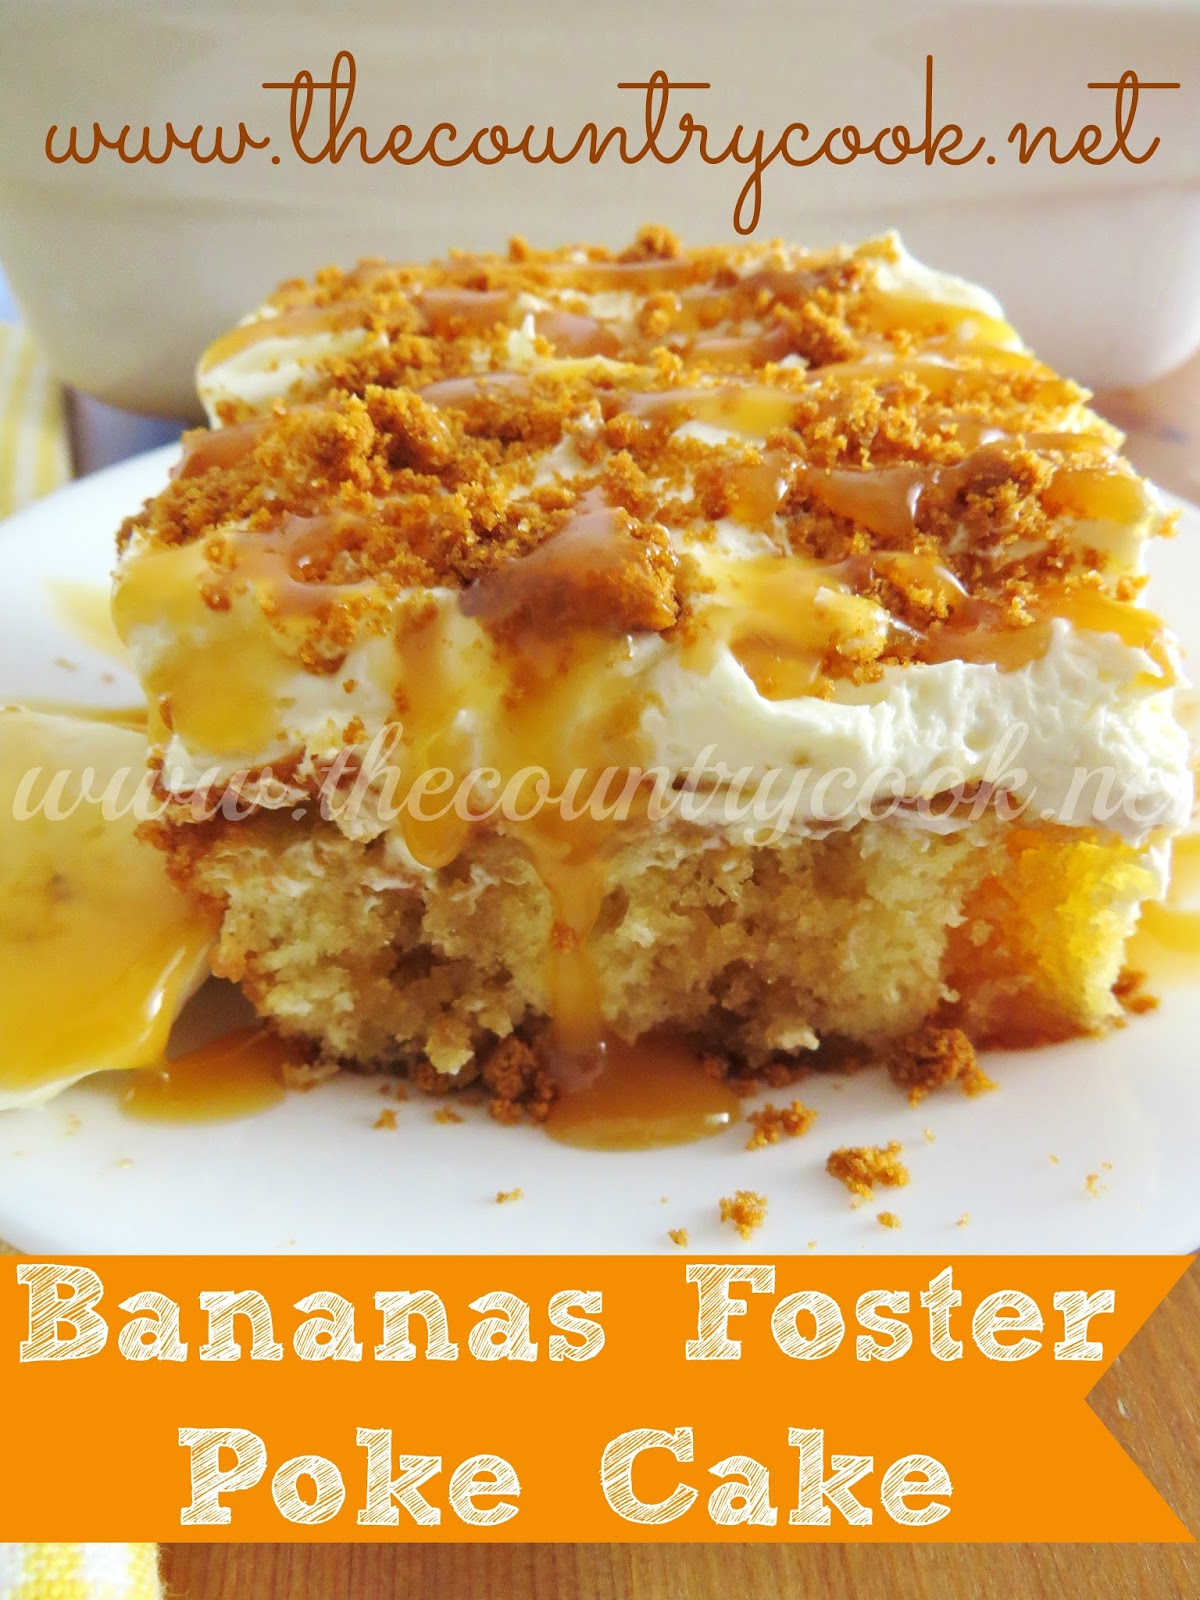 Bananas Foster Butter Cake